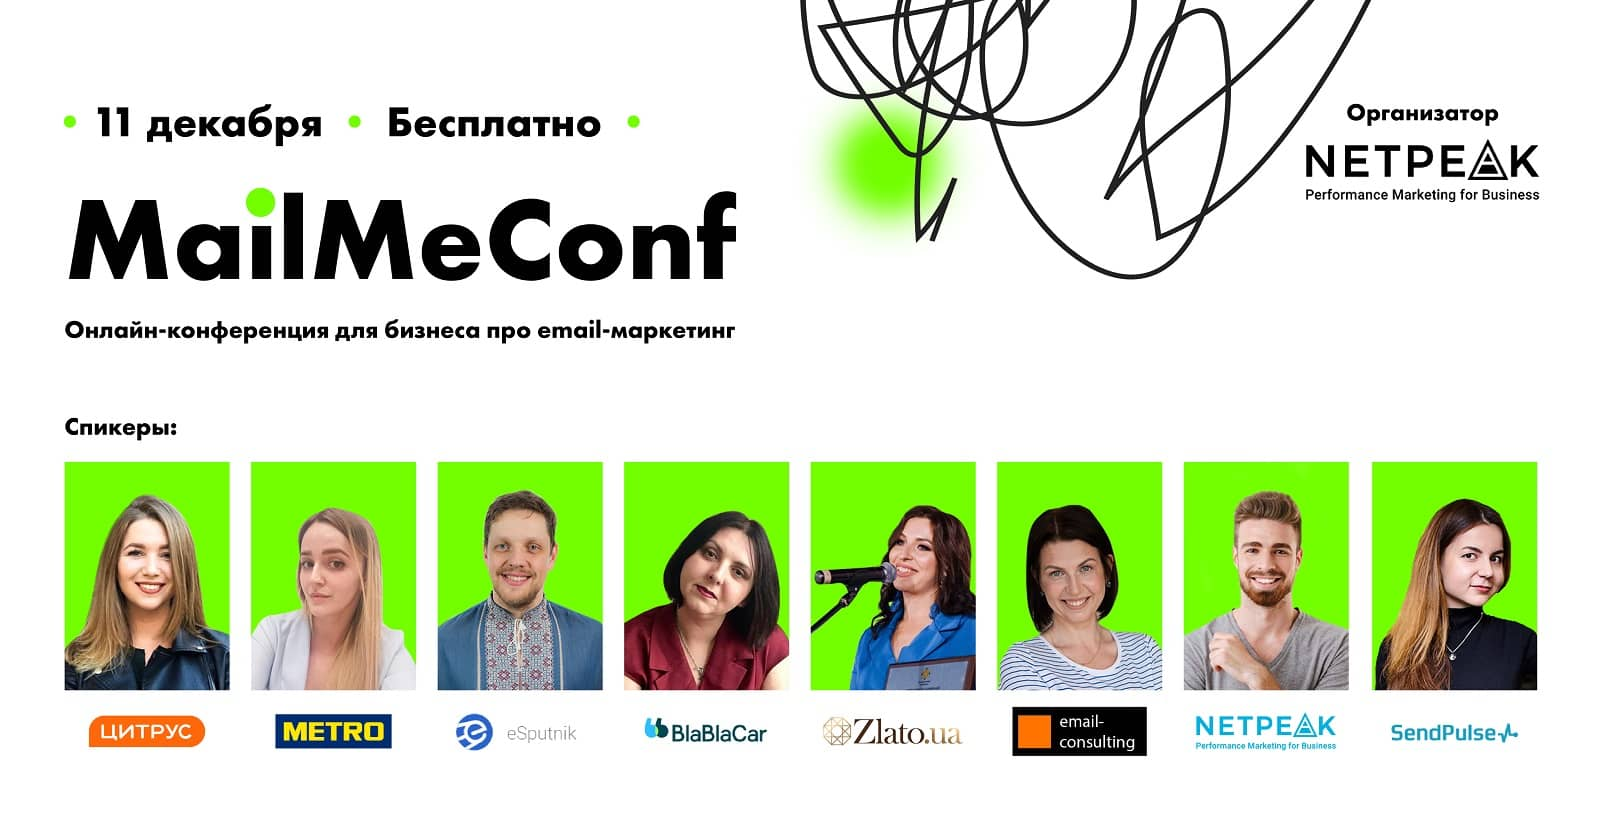 MailMeConf — онлайн-конференция для бизнеса об email-маркетинге